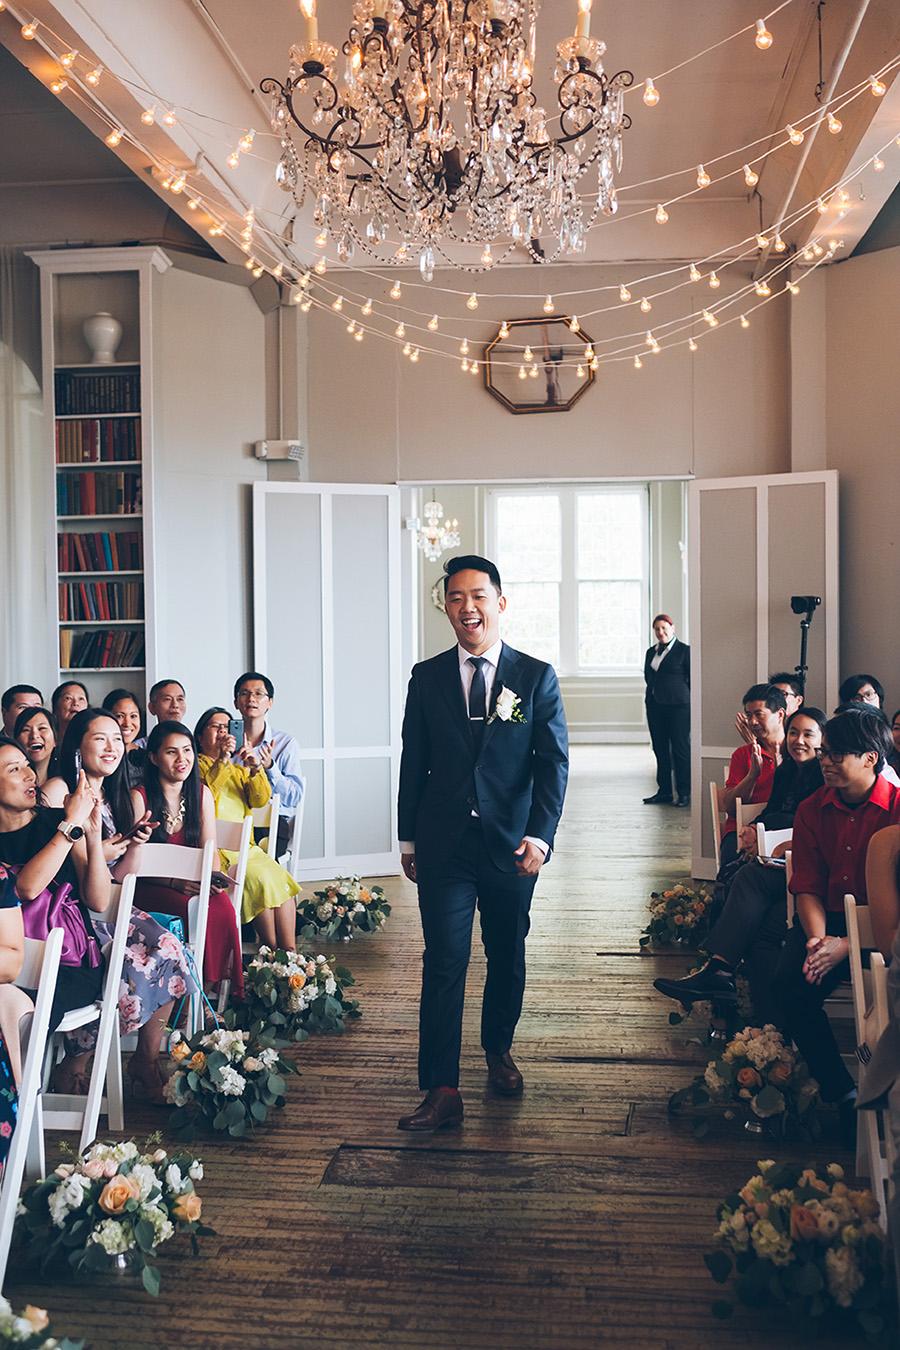 LIN-JOEY-NYC-WEDDING-METROPOLITANBUILDING-CEREMONY-CYNTHIACHUNG-0079.jpg